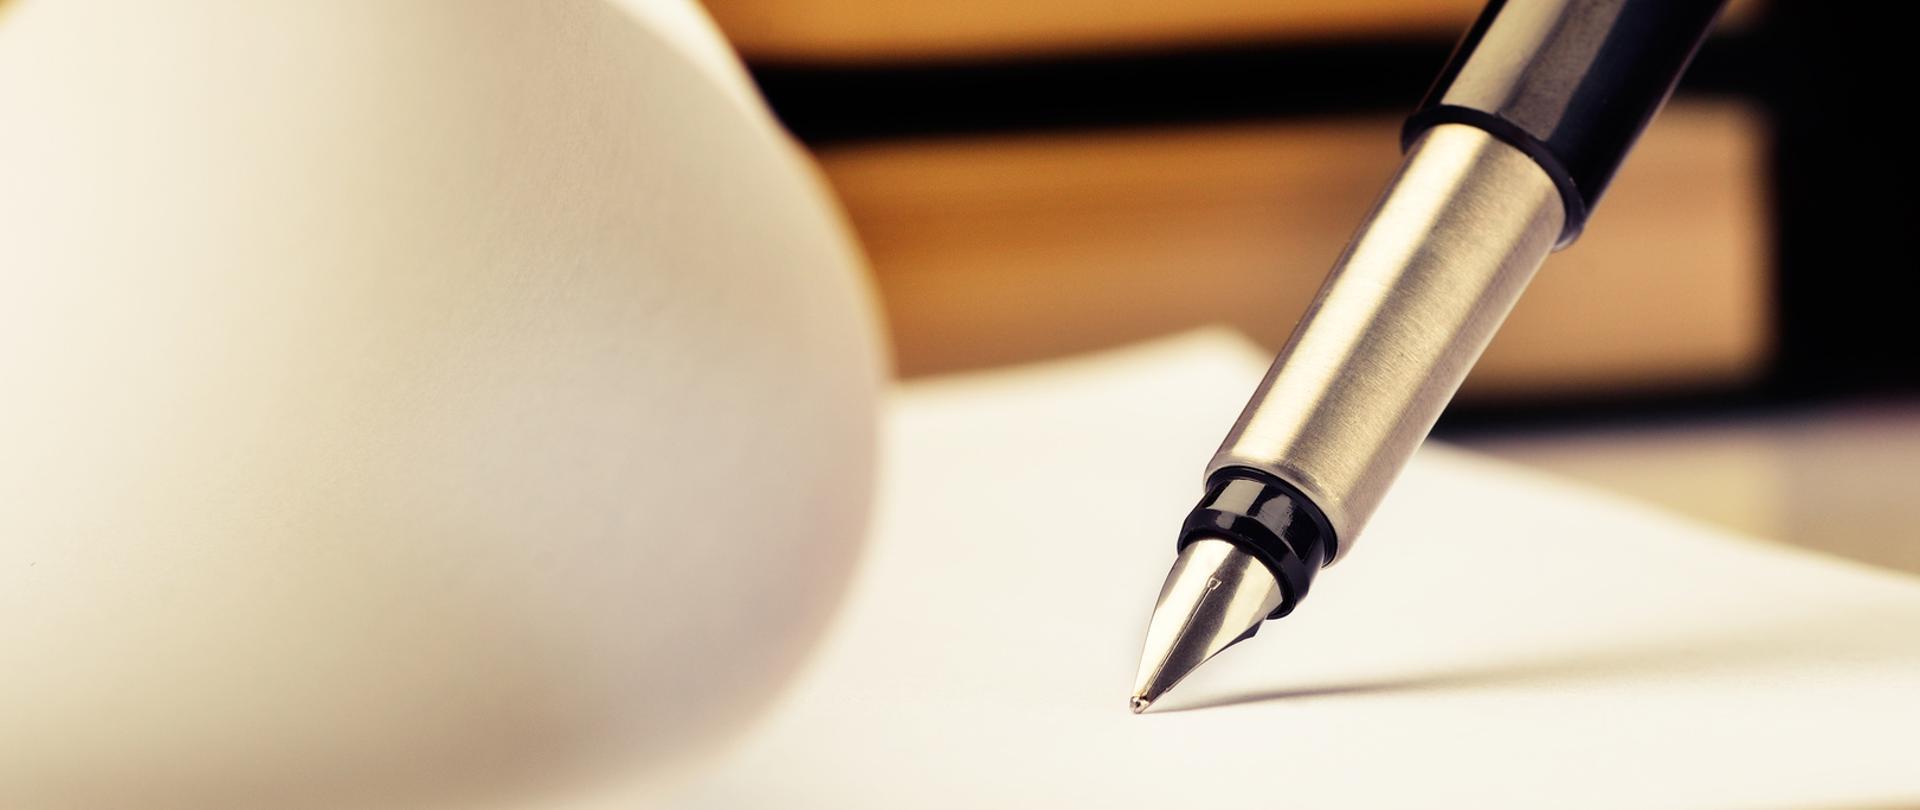 Pióro piszące na kartce papieru.